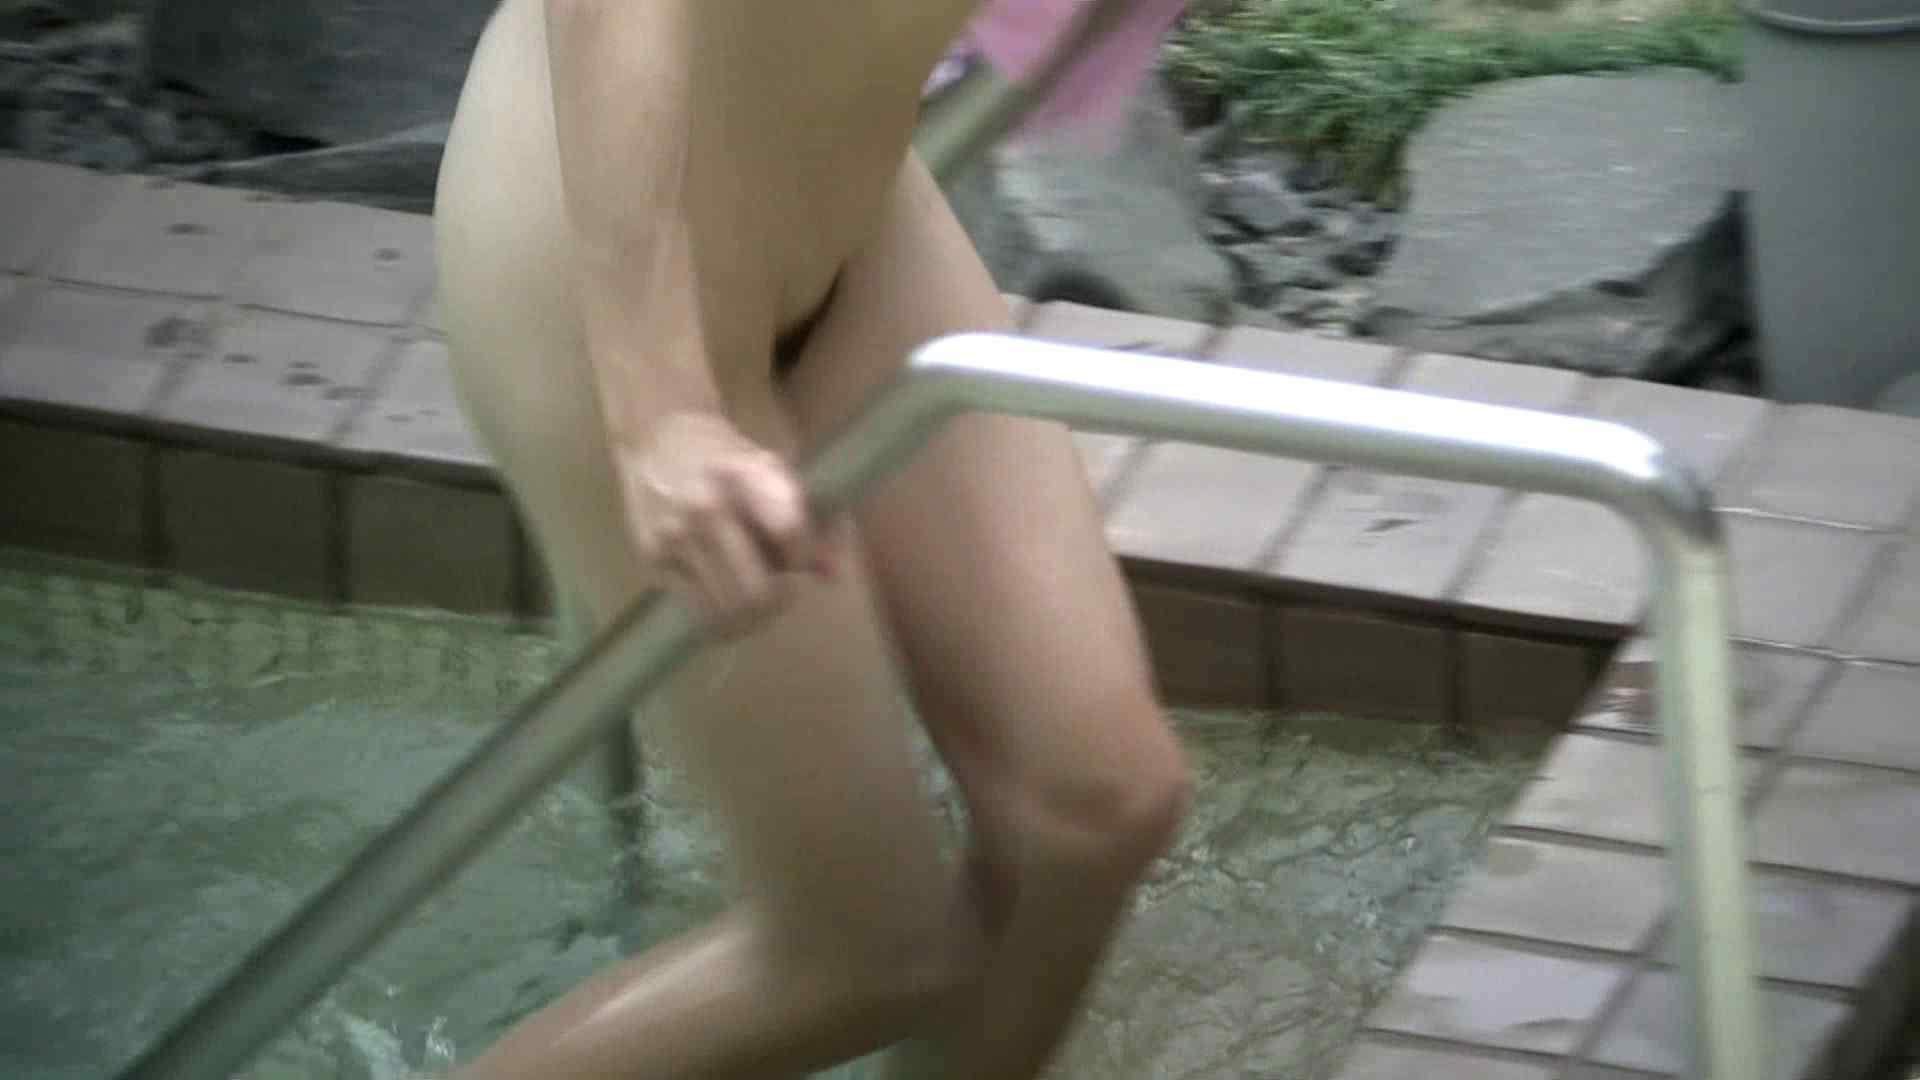 Aquaな露天風呂Vol.654 HなOL | 盗撮  60pic 13